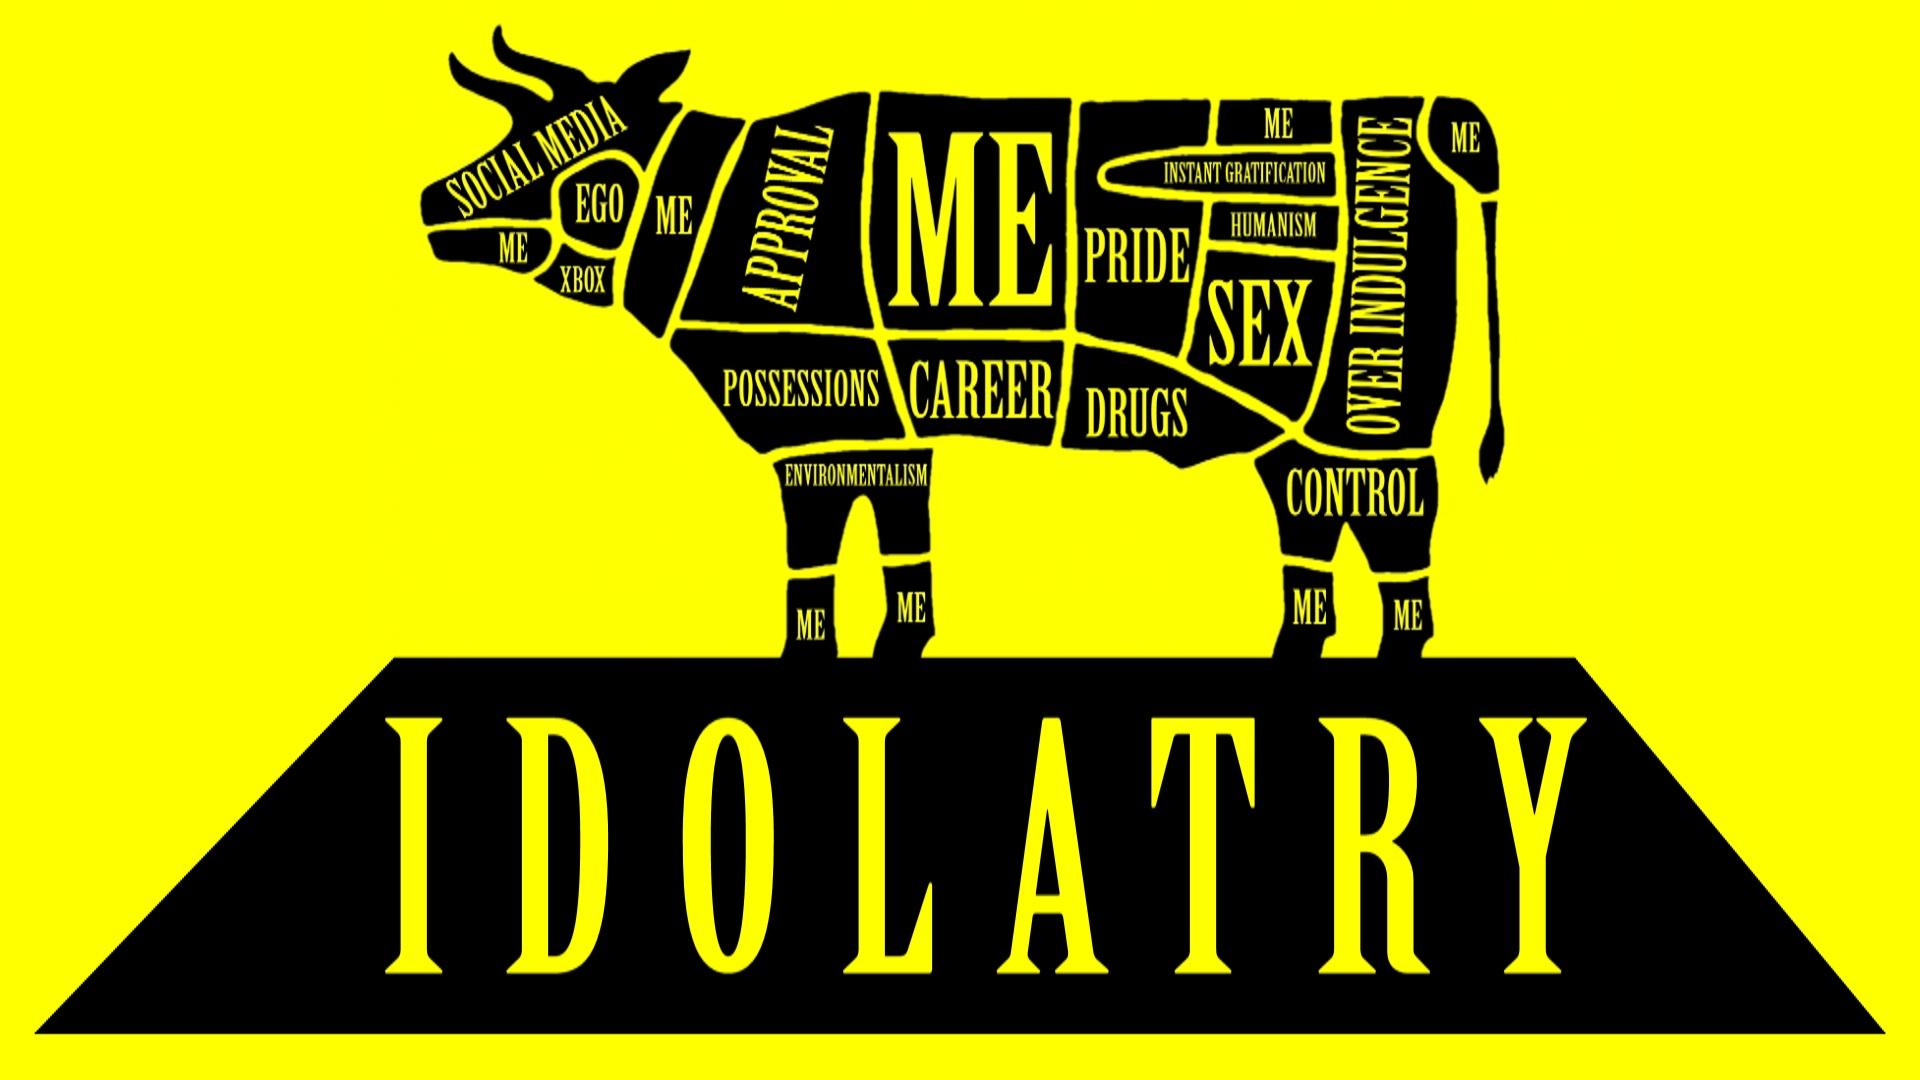 IDOLATRY: Preparing For The Future